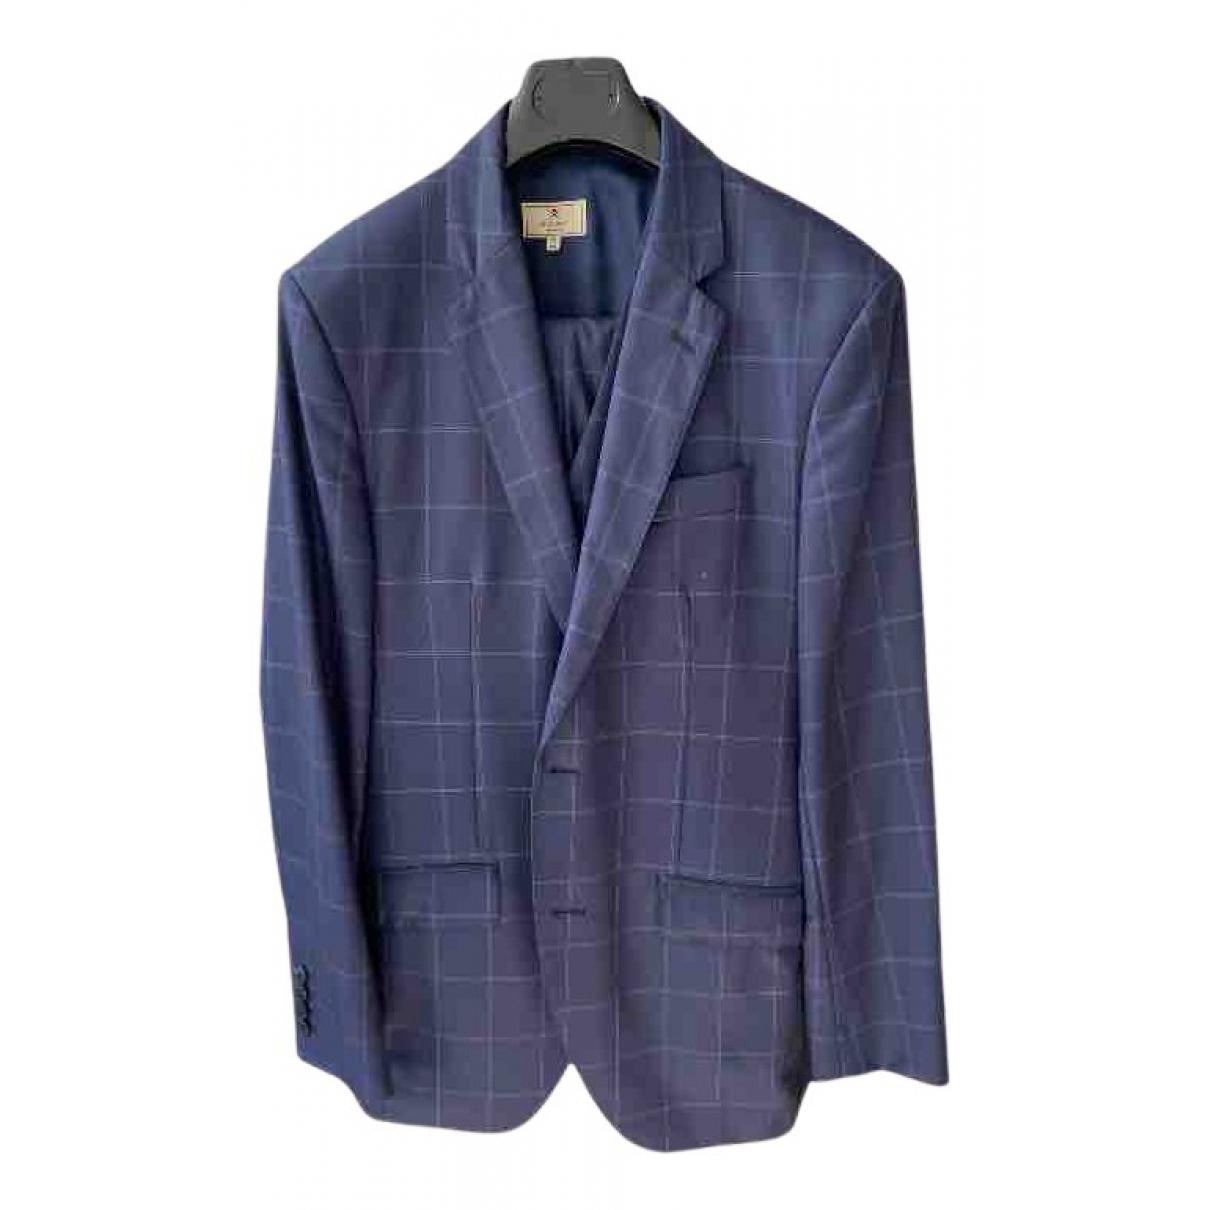 Hackett London N Blue Wool Suits for Men 40 UK - US